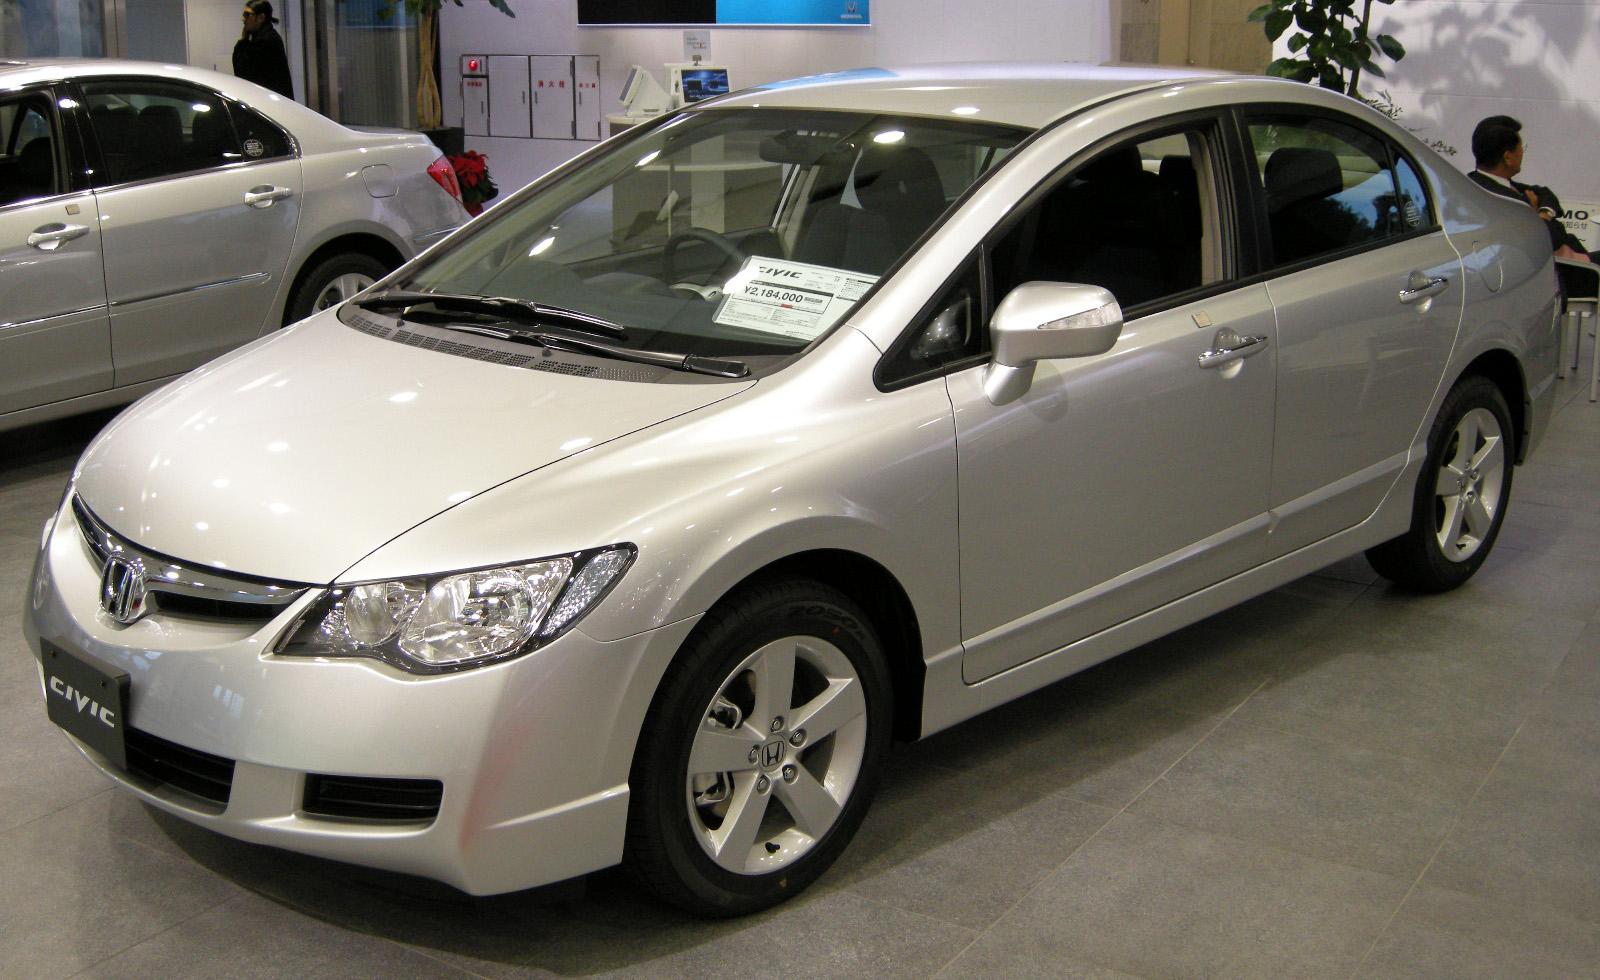 2007 Honda Civic Image 19